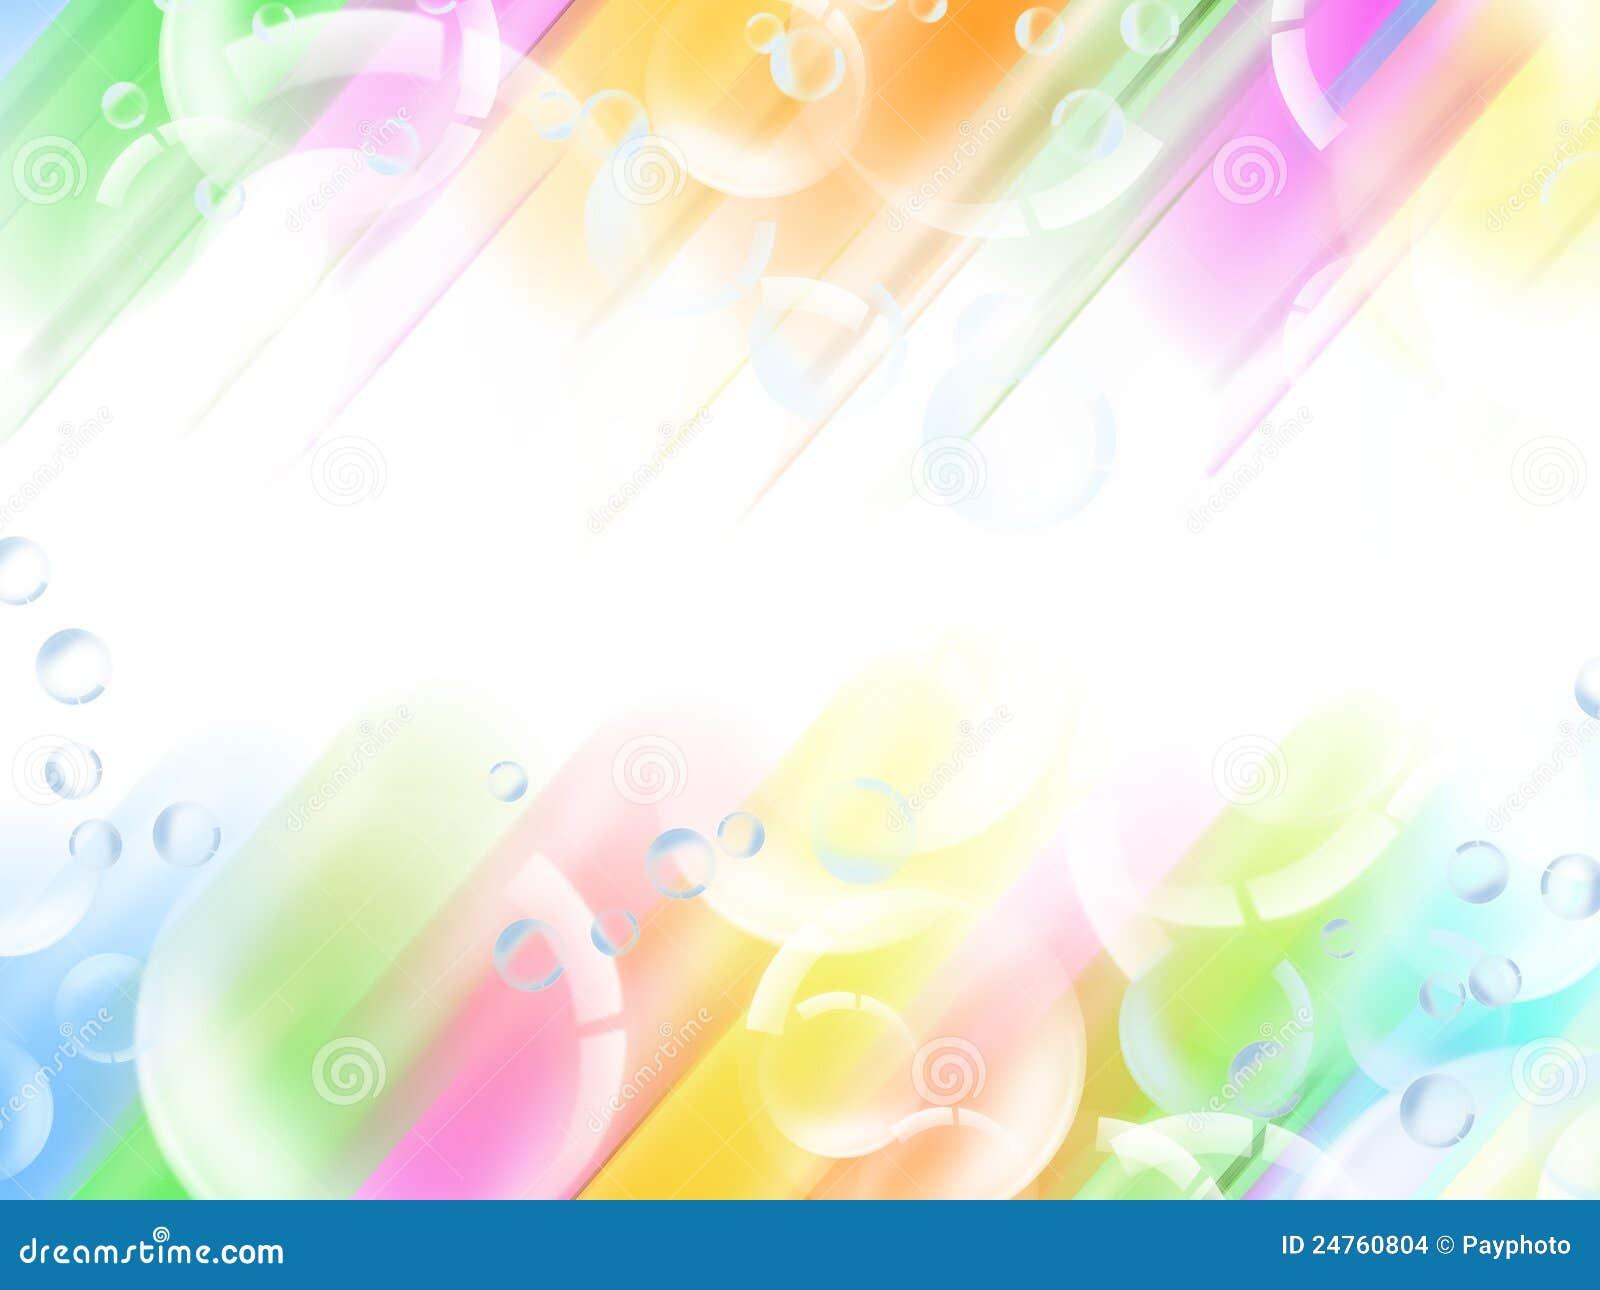 abstract blur light background stock illustration illustration of